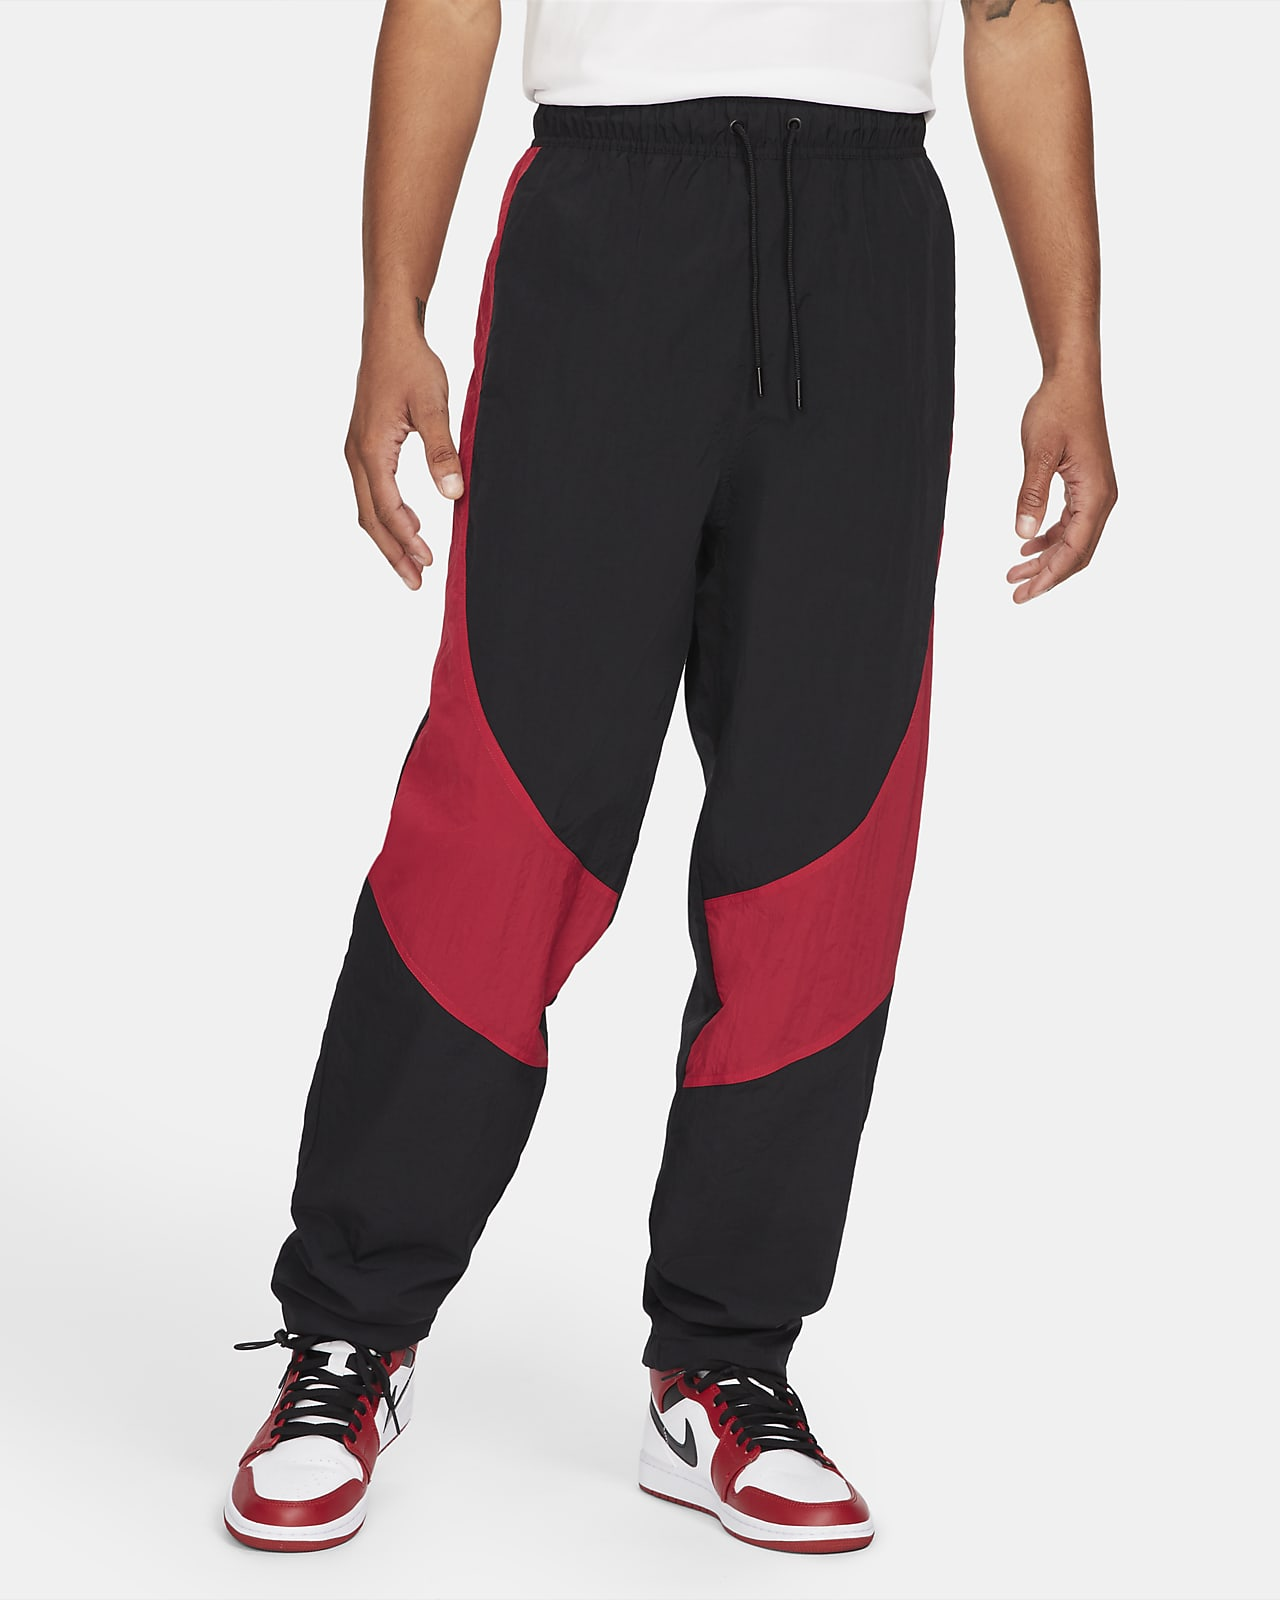 Jordan Flight Suit Men's Trousers